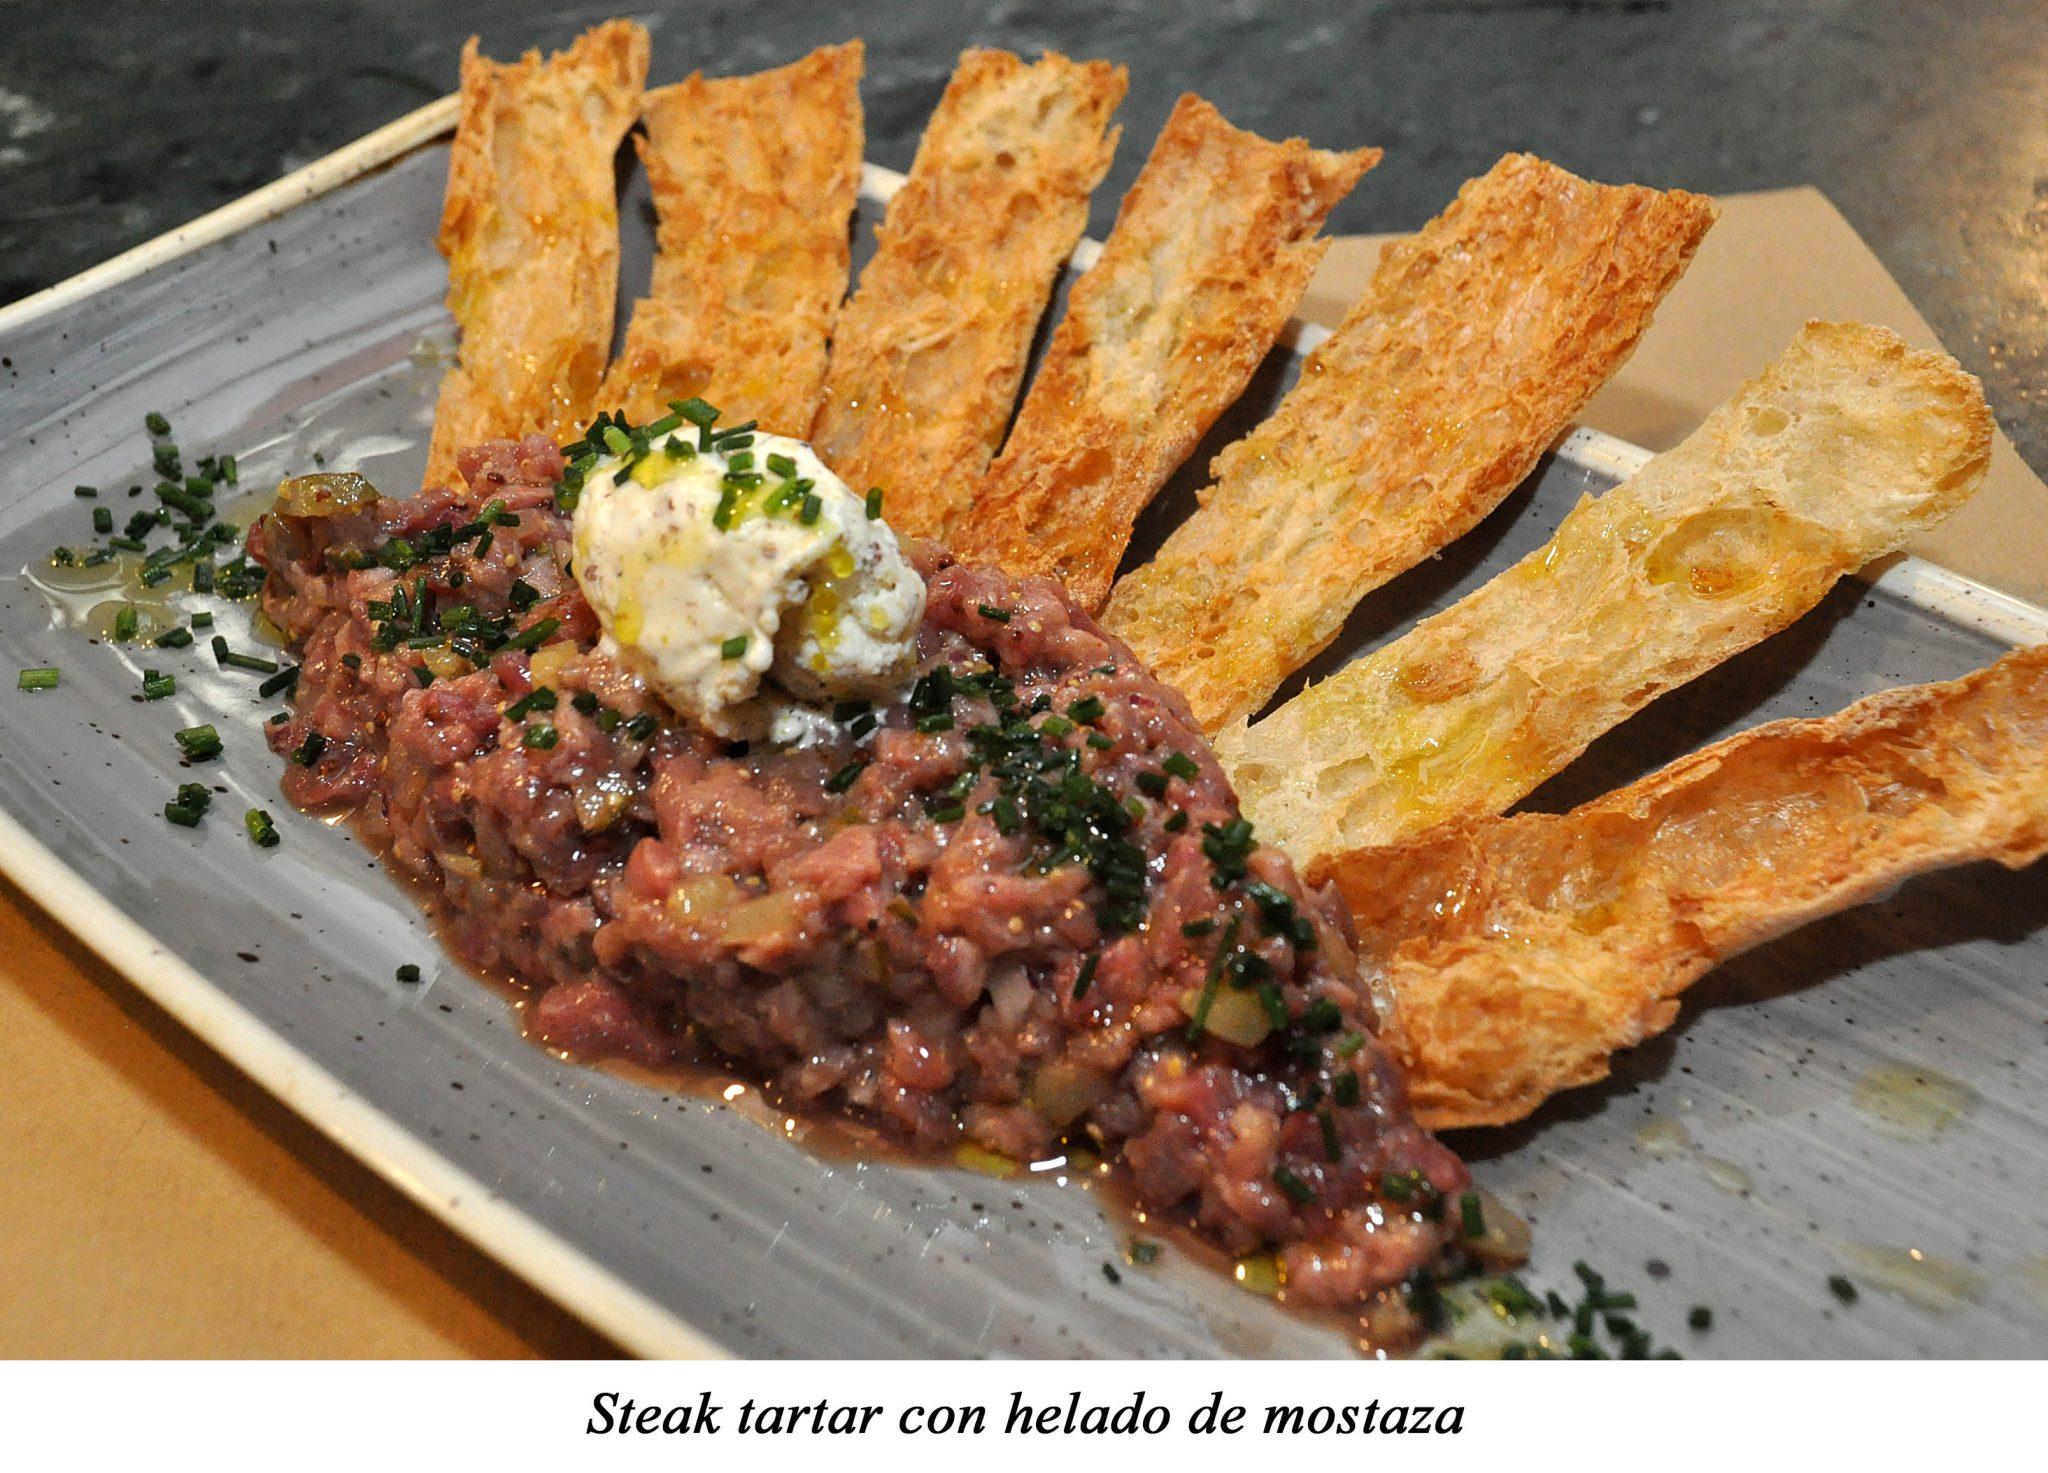 11. Steak Tartar